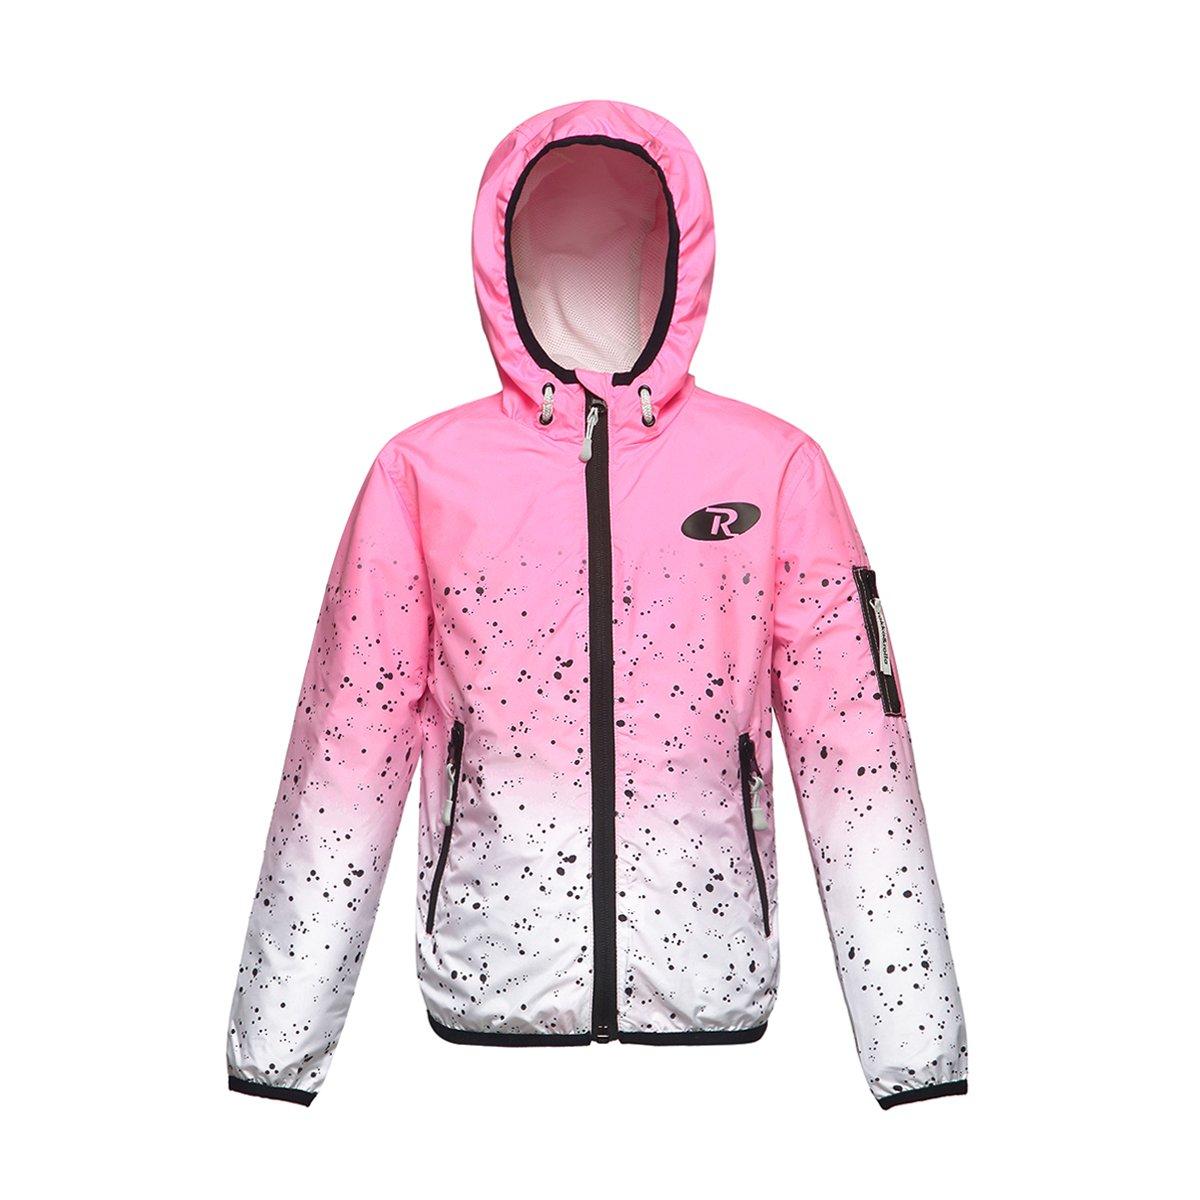 Rokka&Rolla Girls' Lightweight Water Resistant Zip-Up Hooded Windbreaker Jacket